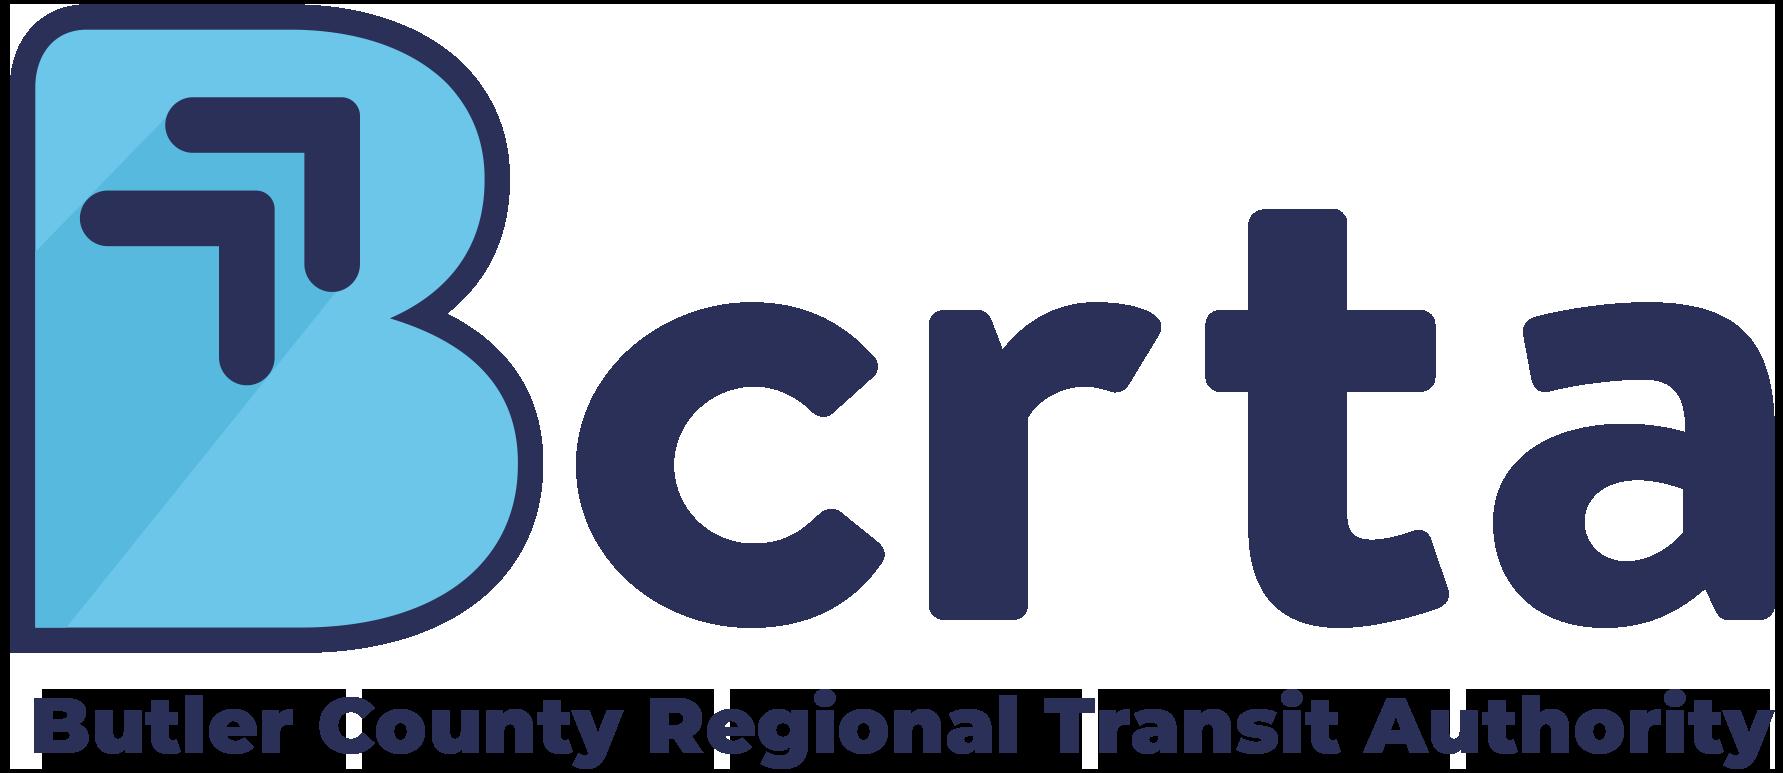 Bcrta logo